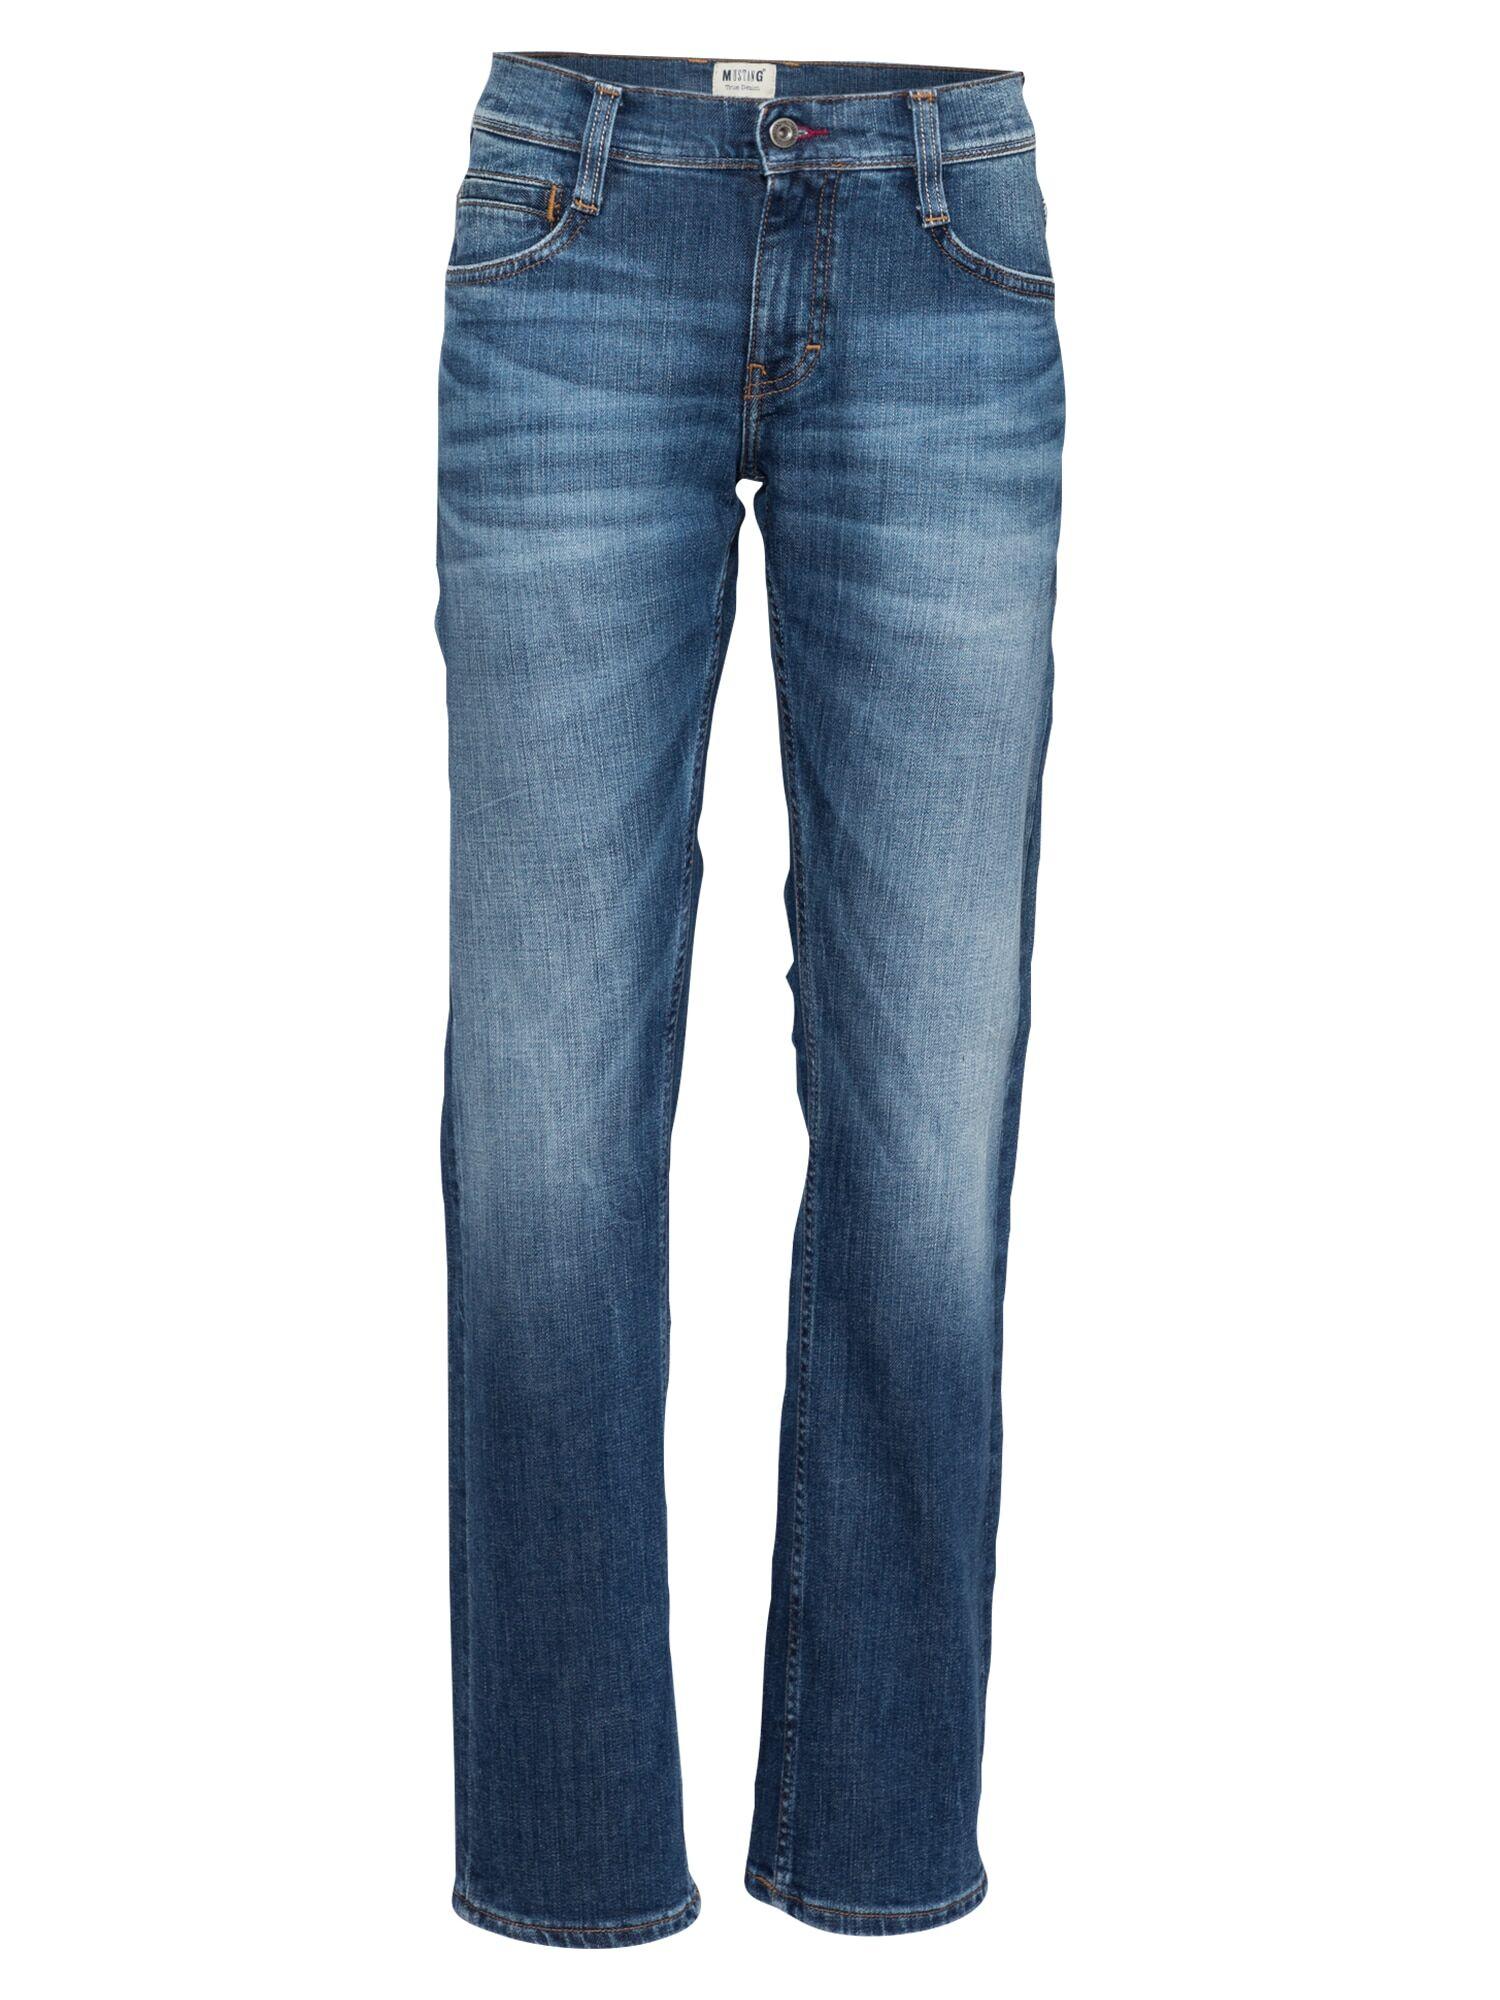 MUSTANG Jean 'Oregon '  - Bleu - Taille: 32 - male